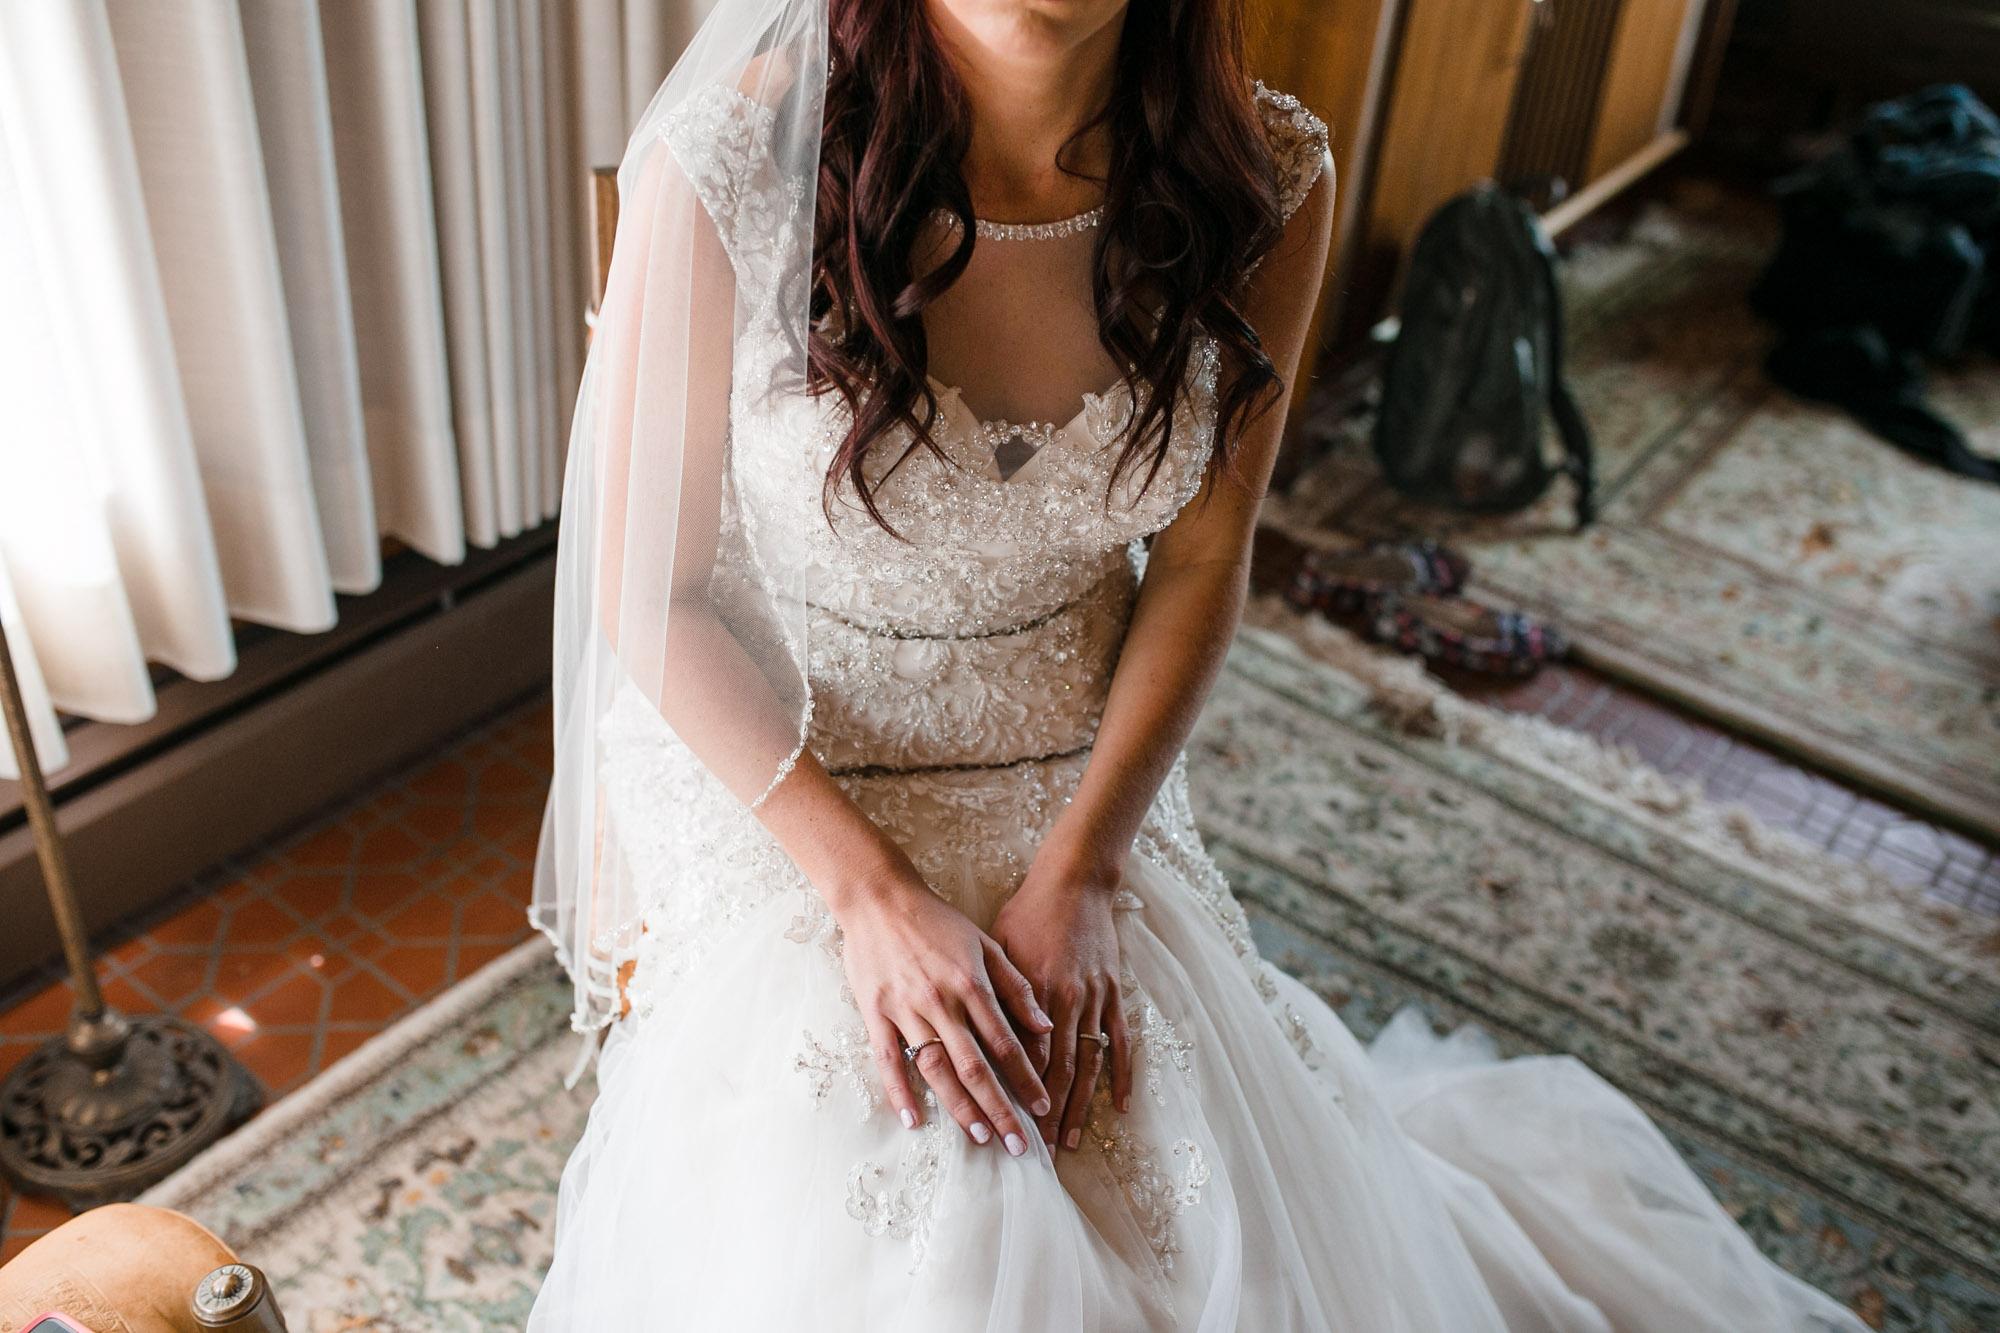 hensville-wedding-downtown-toledo-ohio (14 of 103).jpg